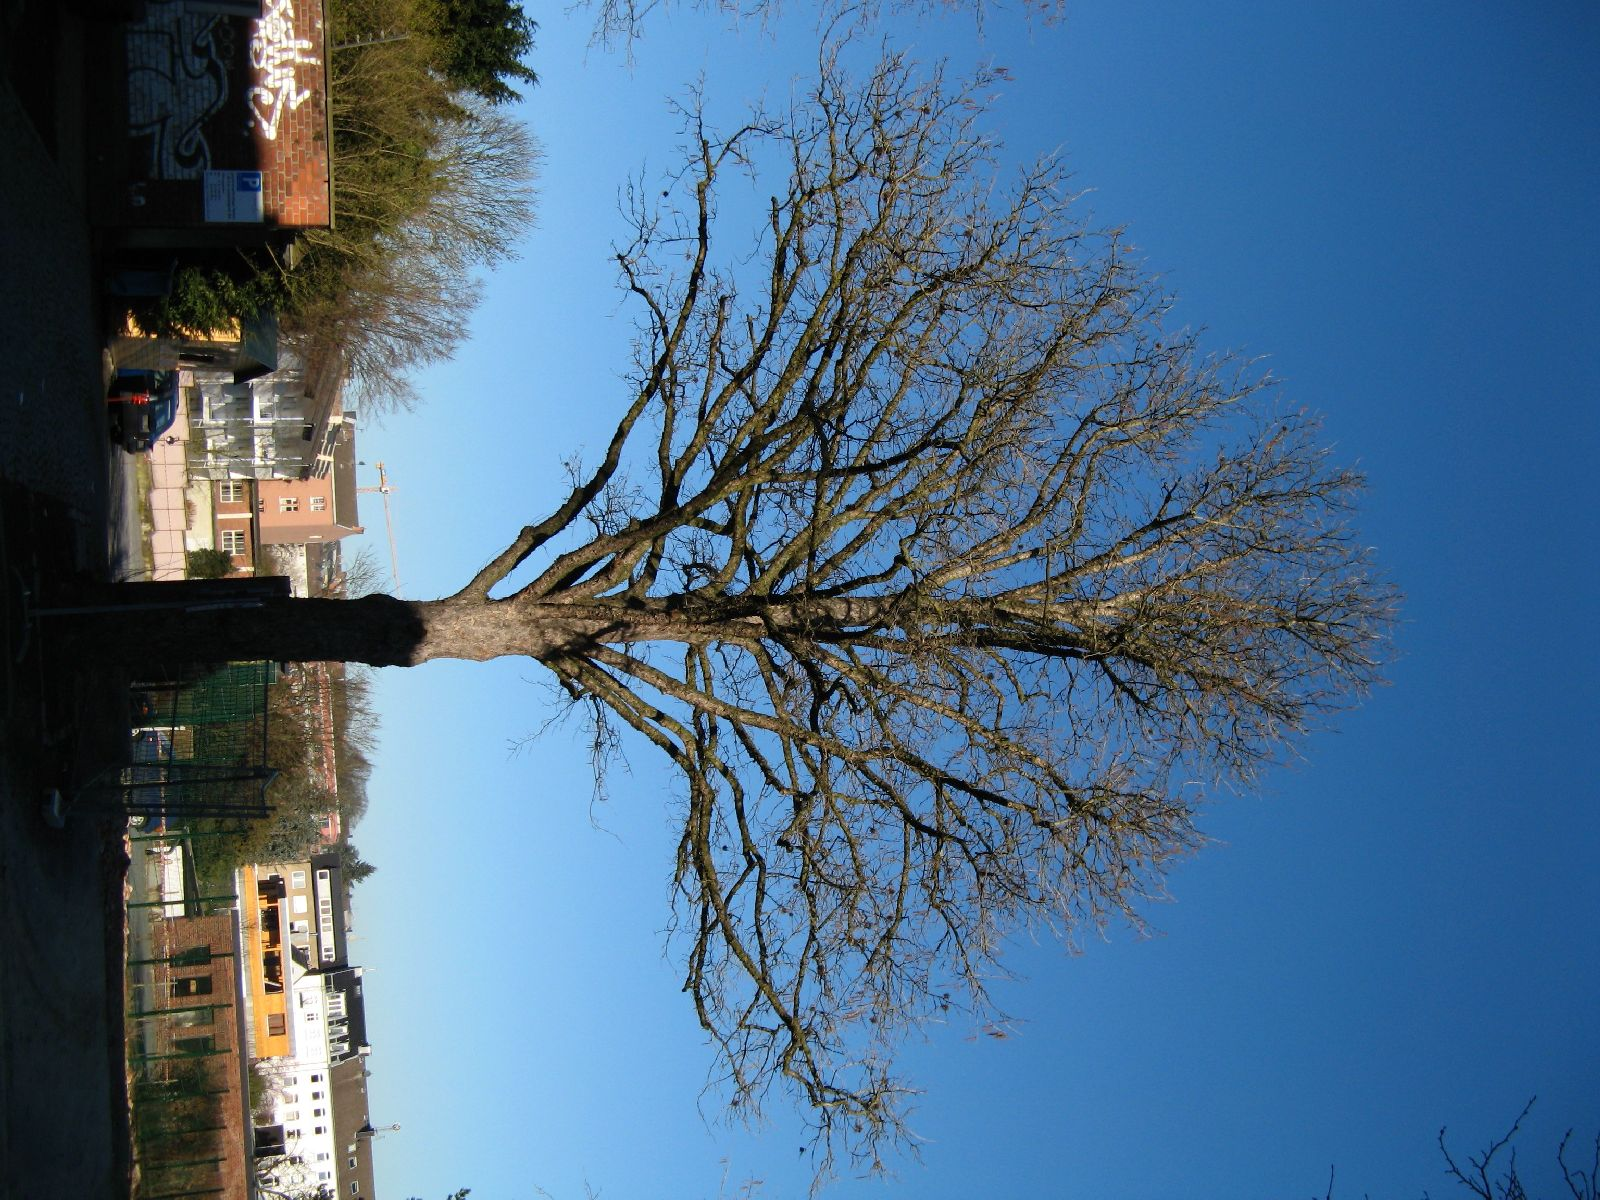 Plants-Trees_Photo_Texture_B_42300